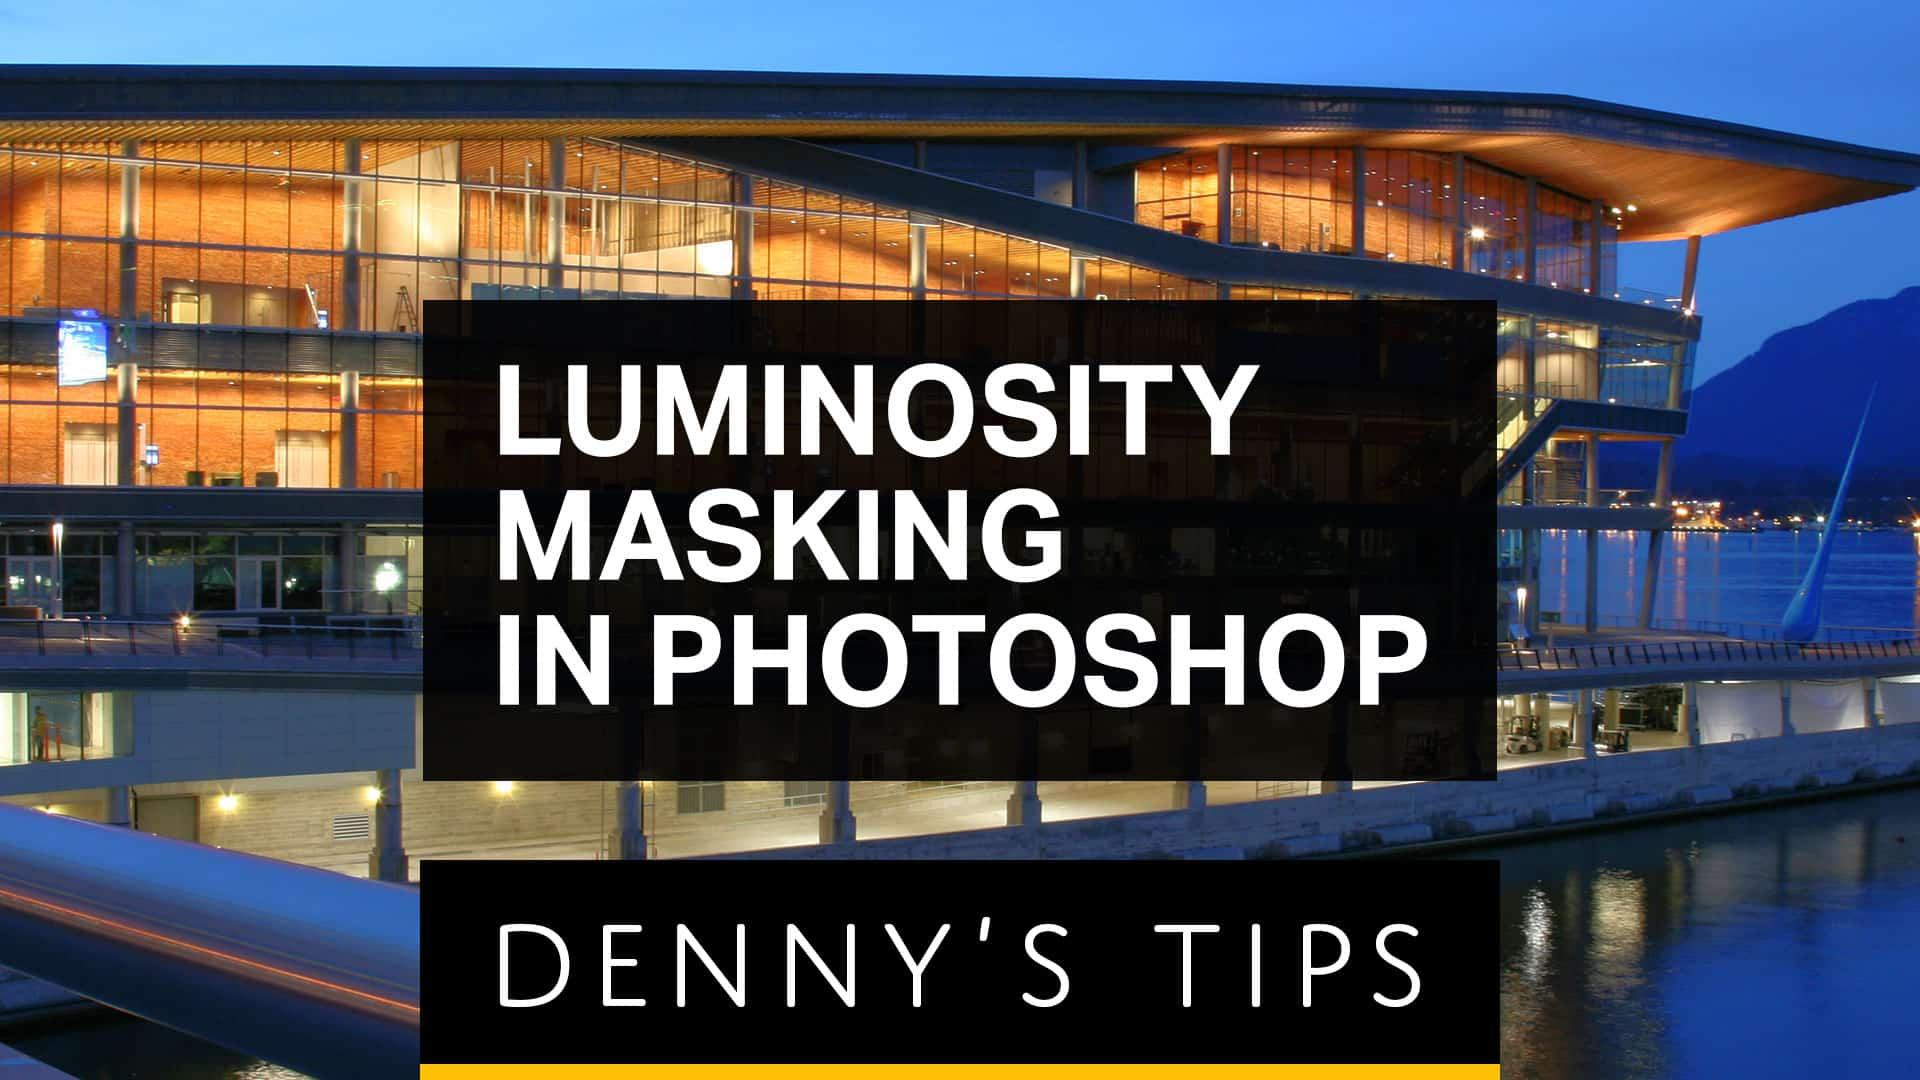 2 Ways to Luminosity Mask in Photoshop